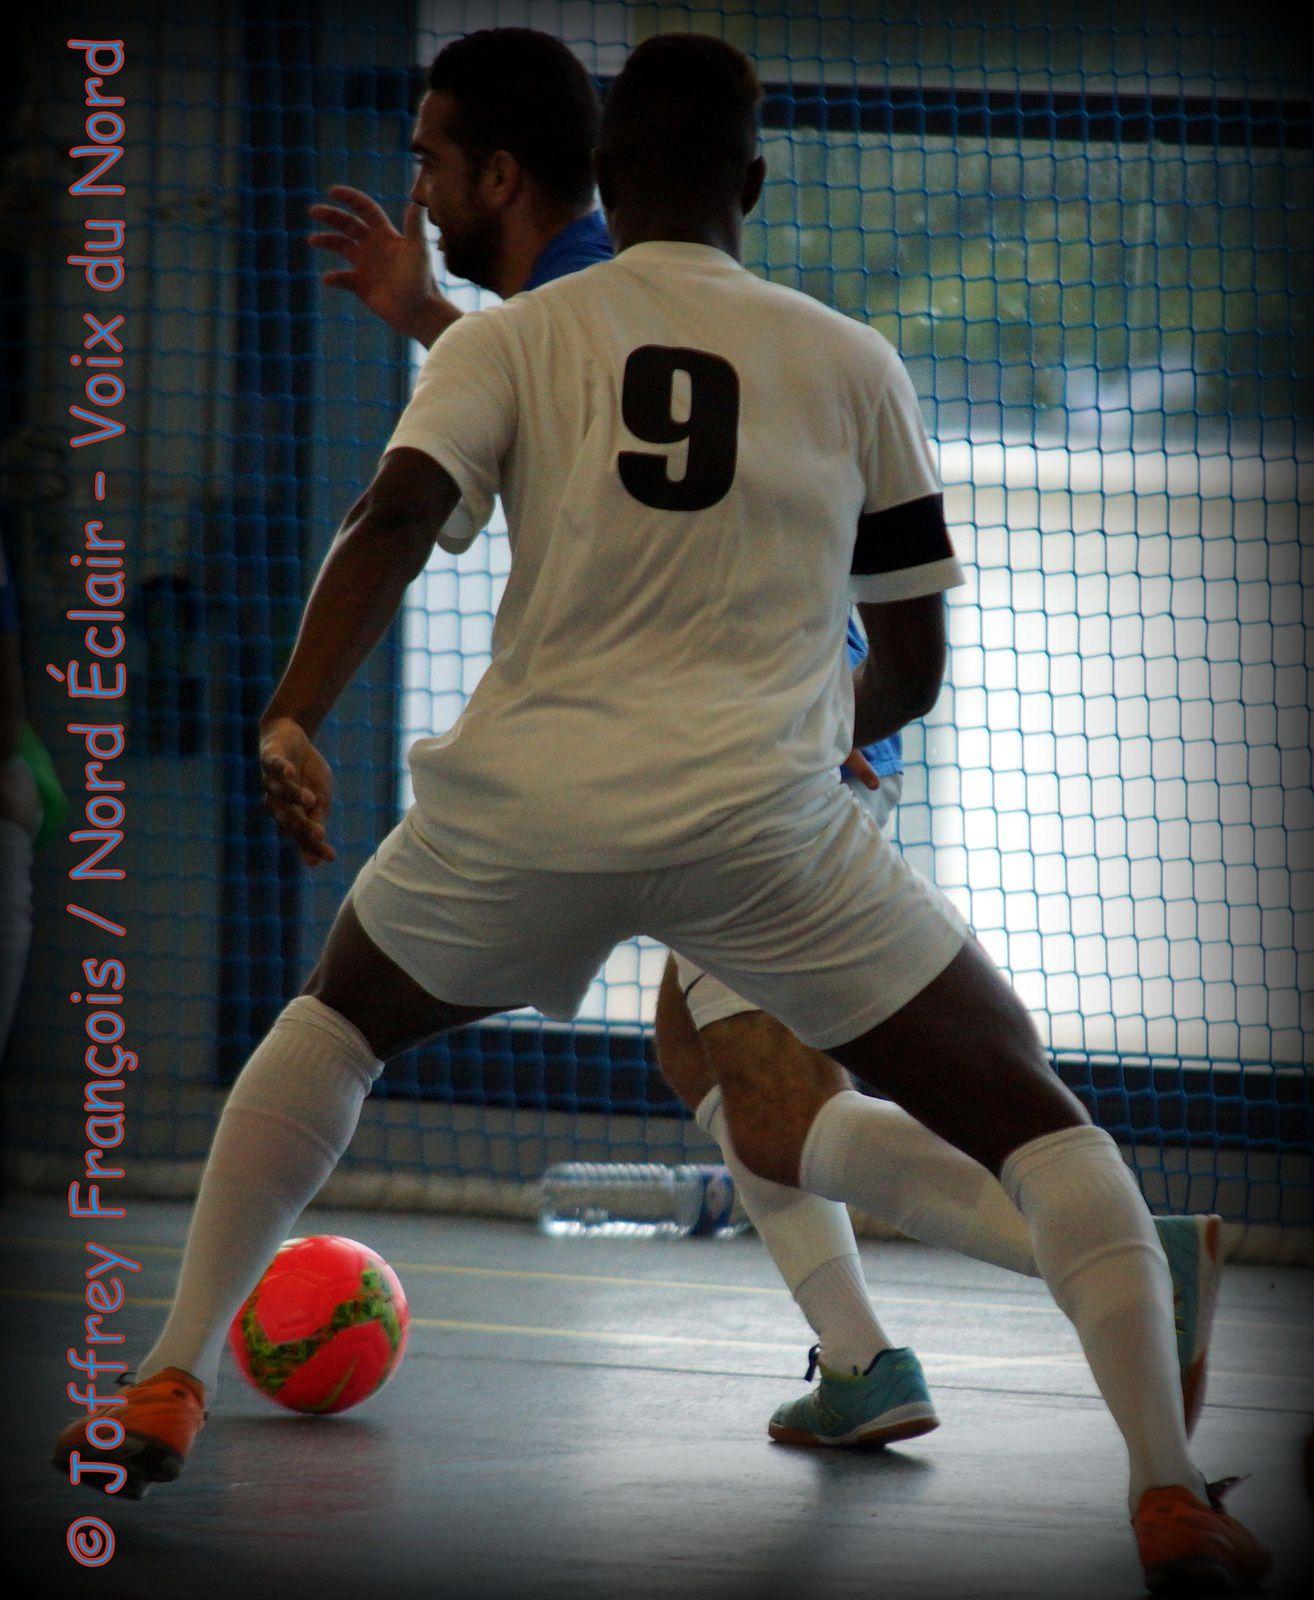 20.09.14 Roubaix Futsal - Faches // Tourcoing - Paris FC